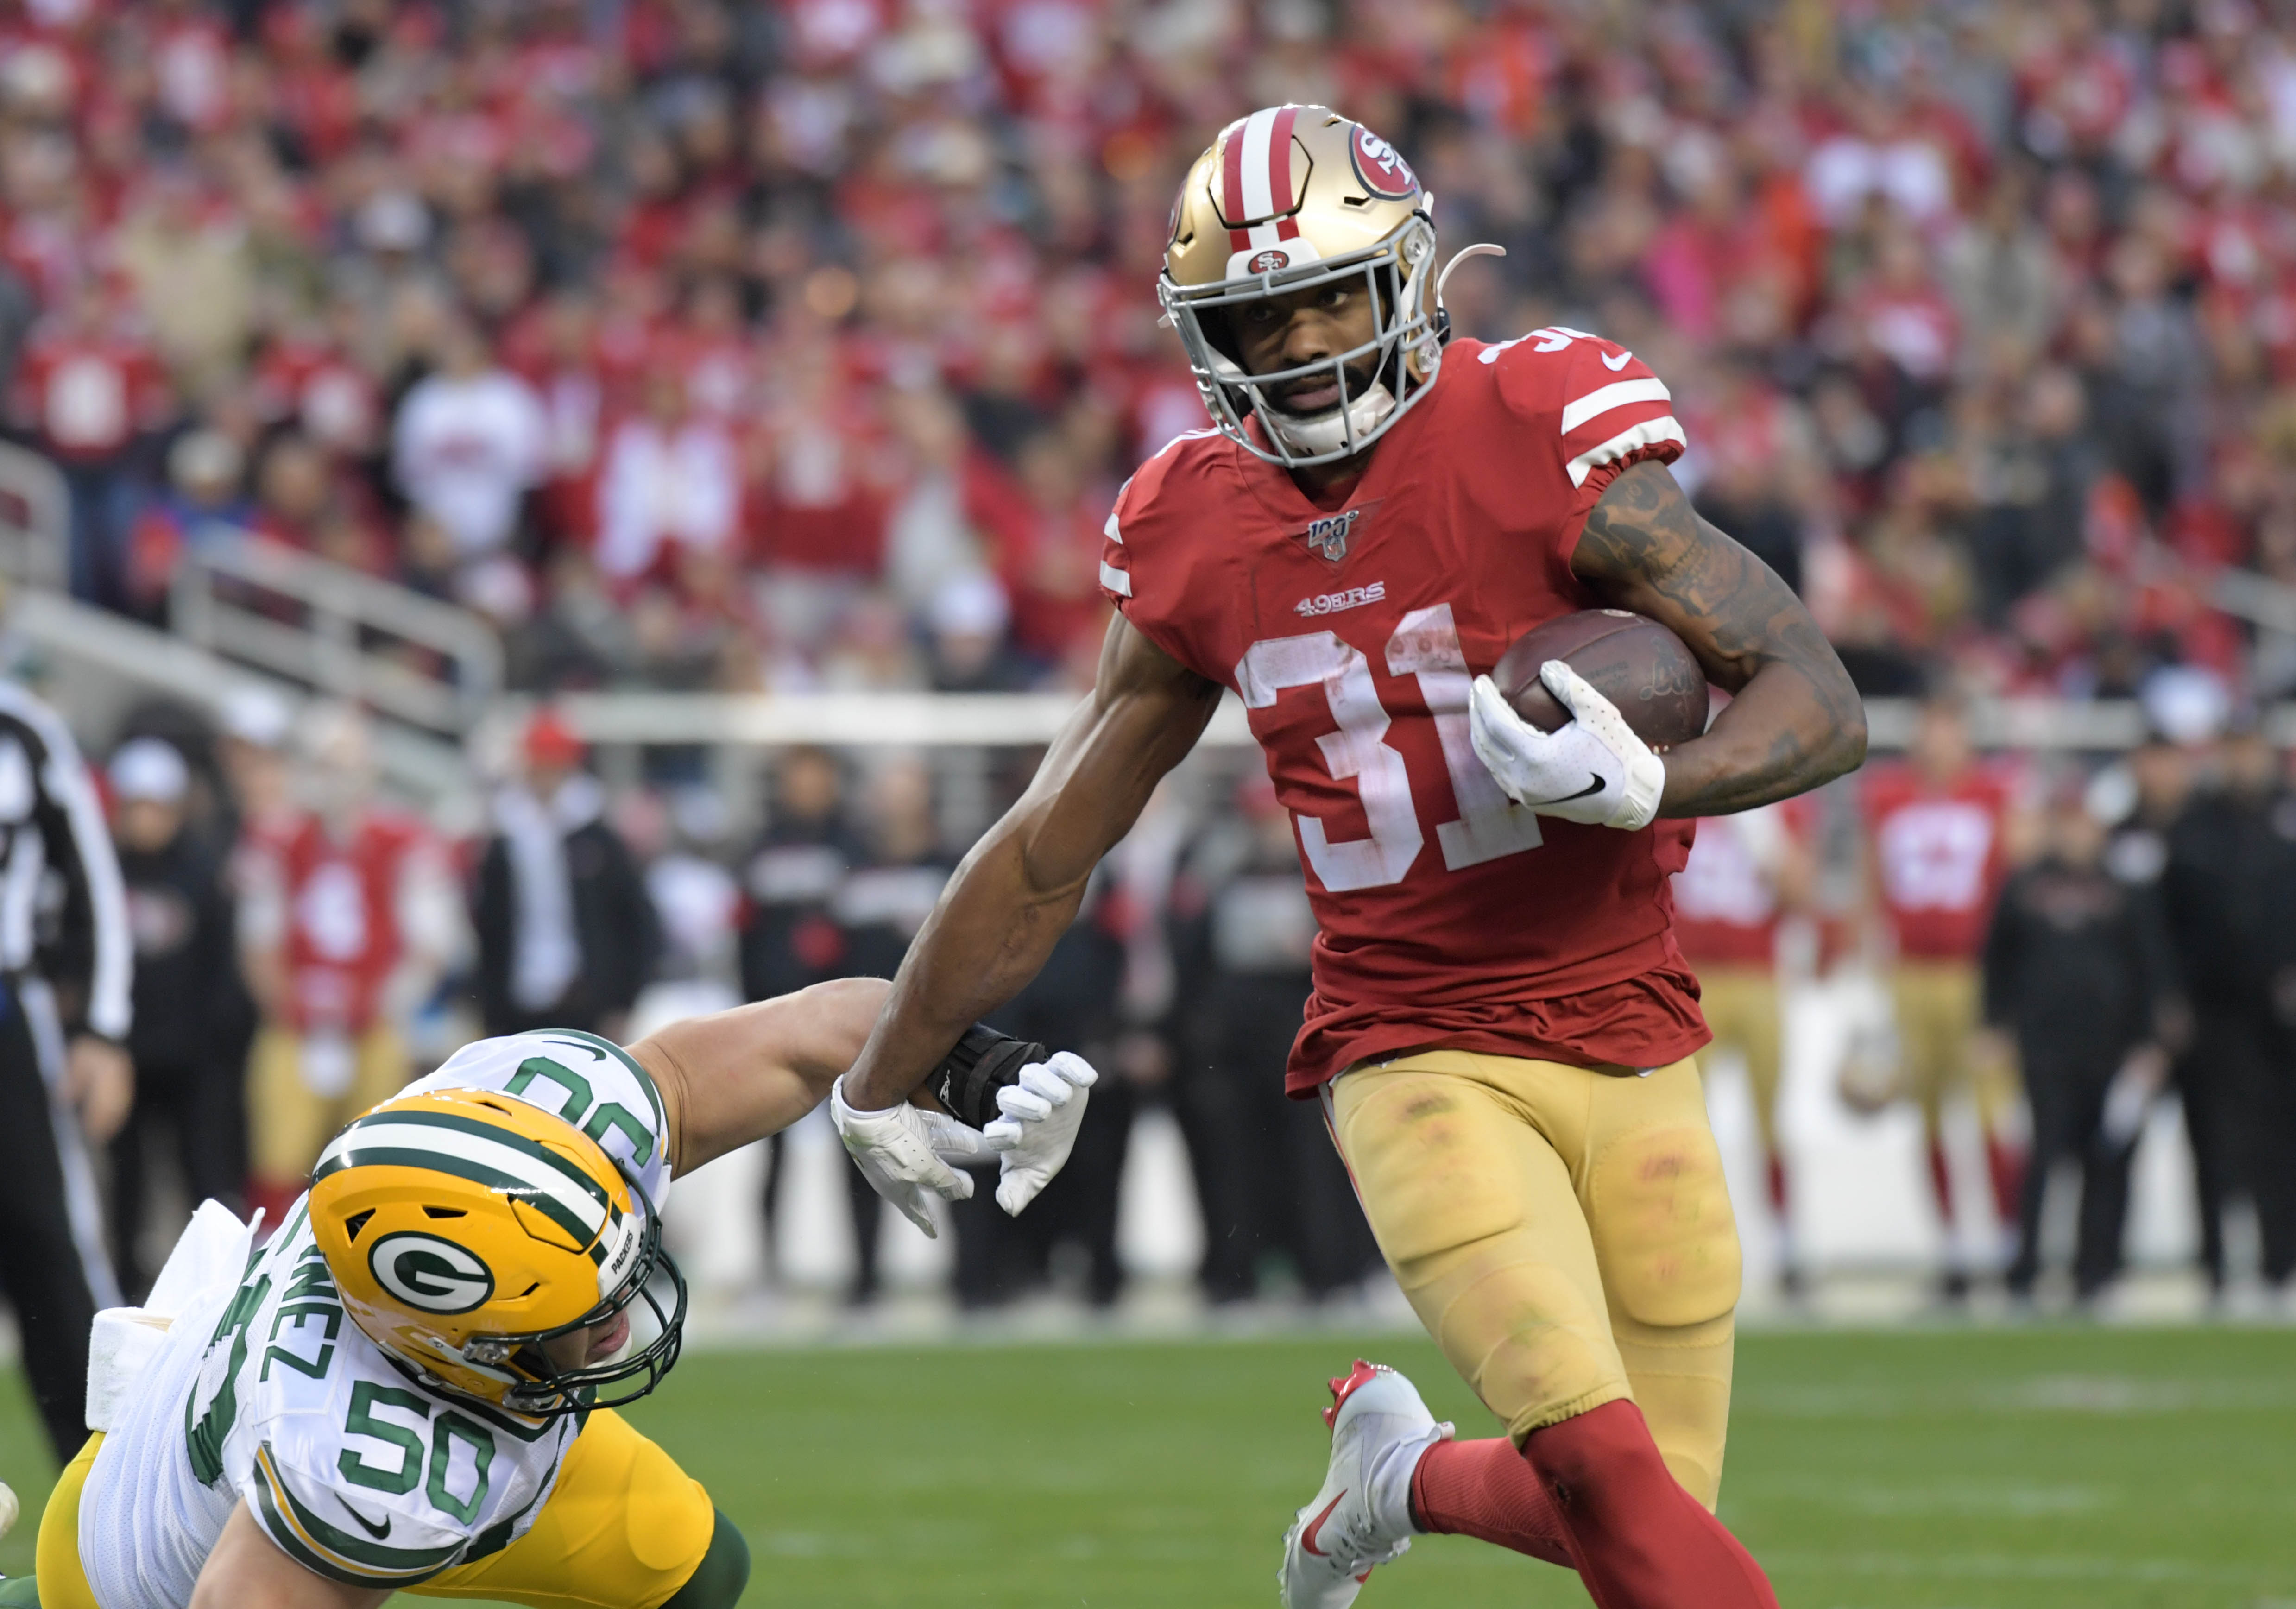 San Francisco 49ers running back Raheem Mostert runs past Green Bay Packers inside linebacker Blake Martinez in the second quarter of the NFC Championship Game at Levi's Stadium.